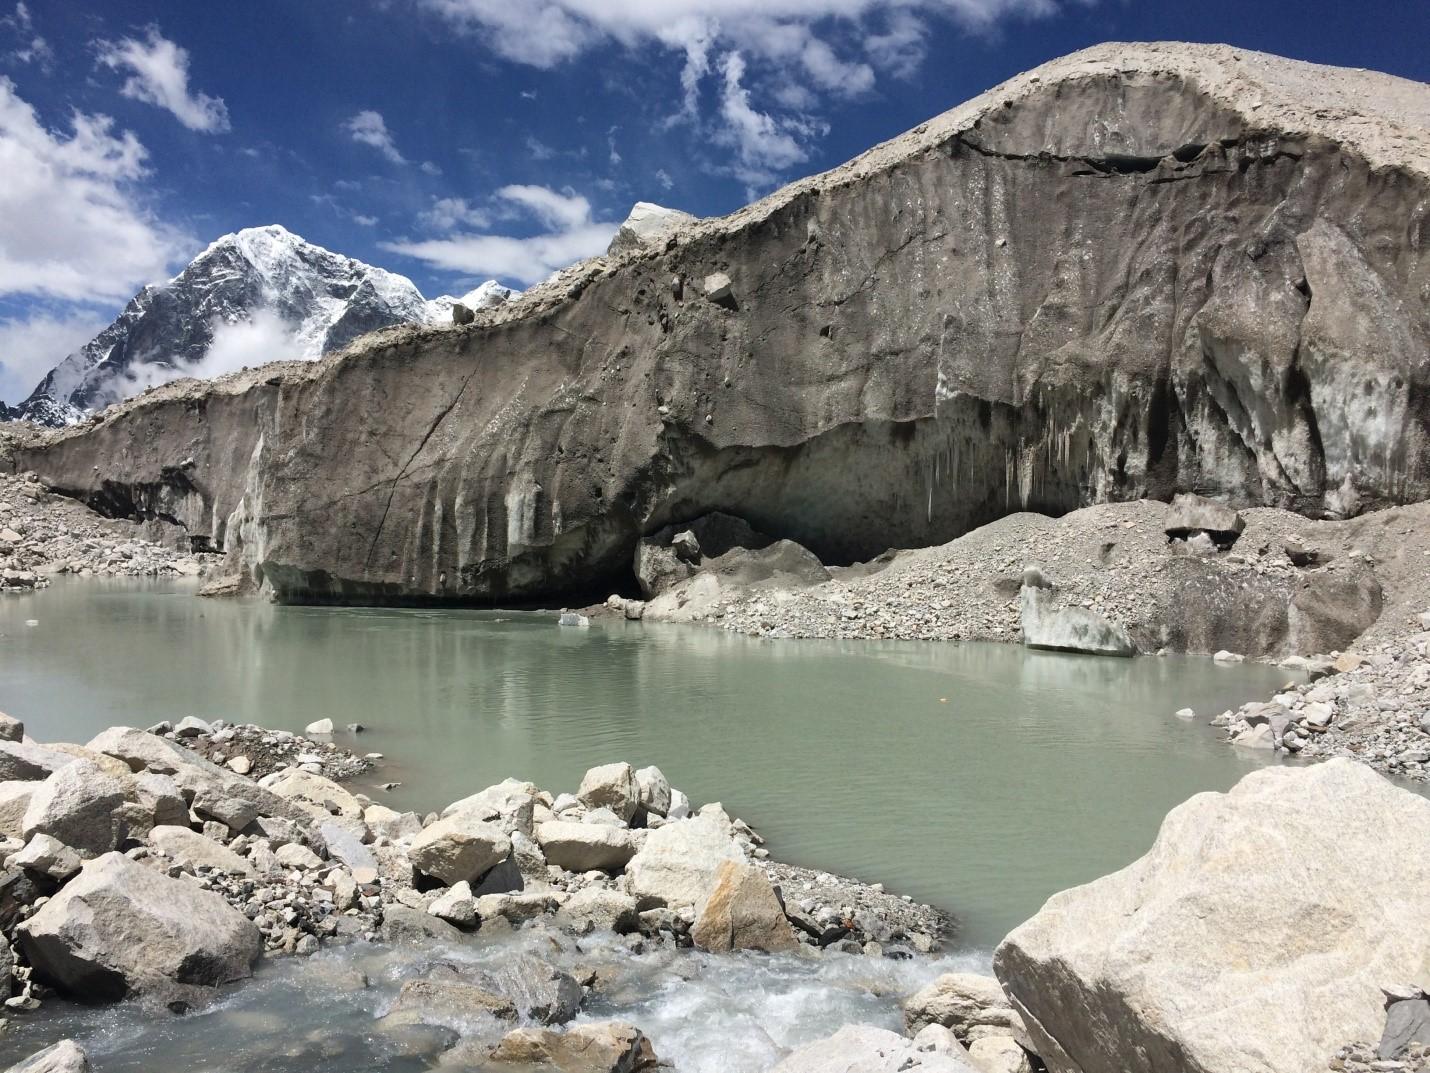 Figure 3 . Supraglacial pond and ice cliff on Khumbu Glacier (credit: Owen King).